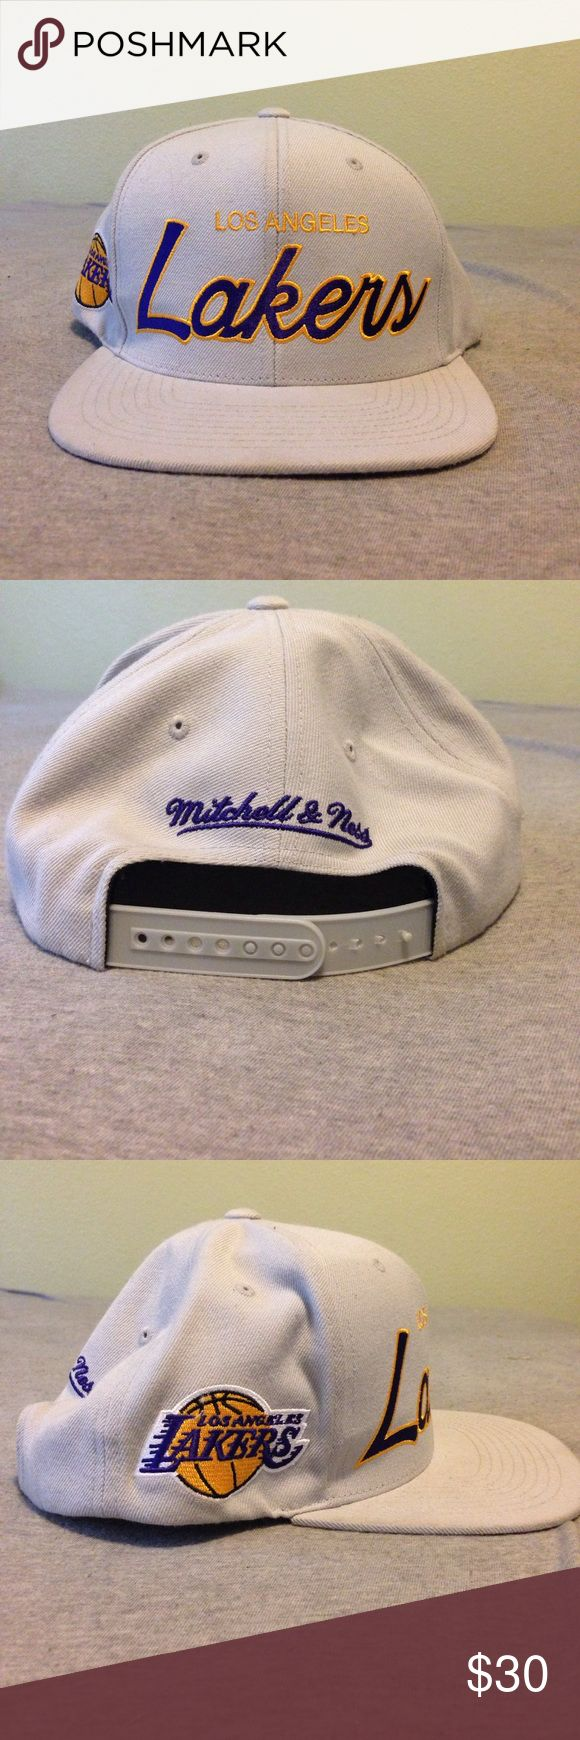 Gray Los Angeles Laker Flat Bill SnapBack. Brand new SnapBack LA Laker hat. One size fits all. No damage! Mitchell & Ness Accessories Hats